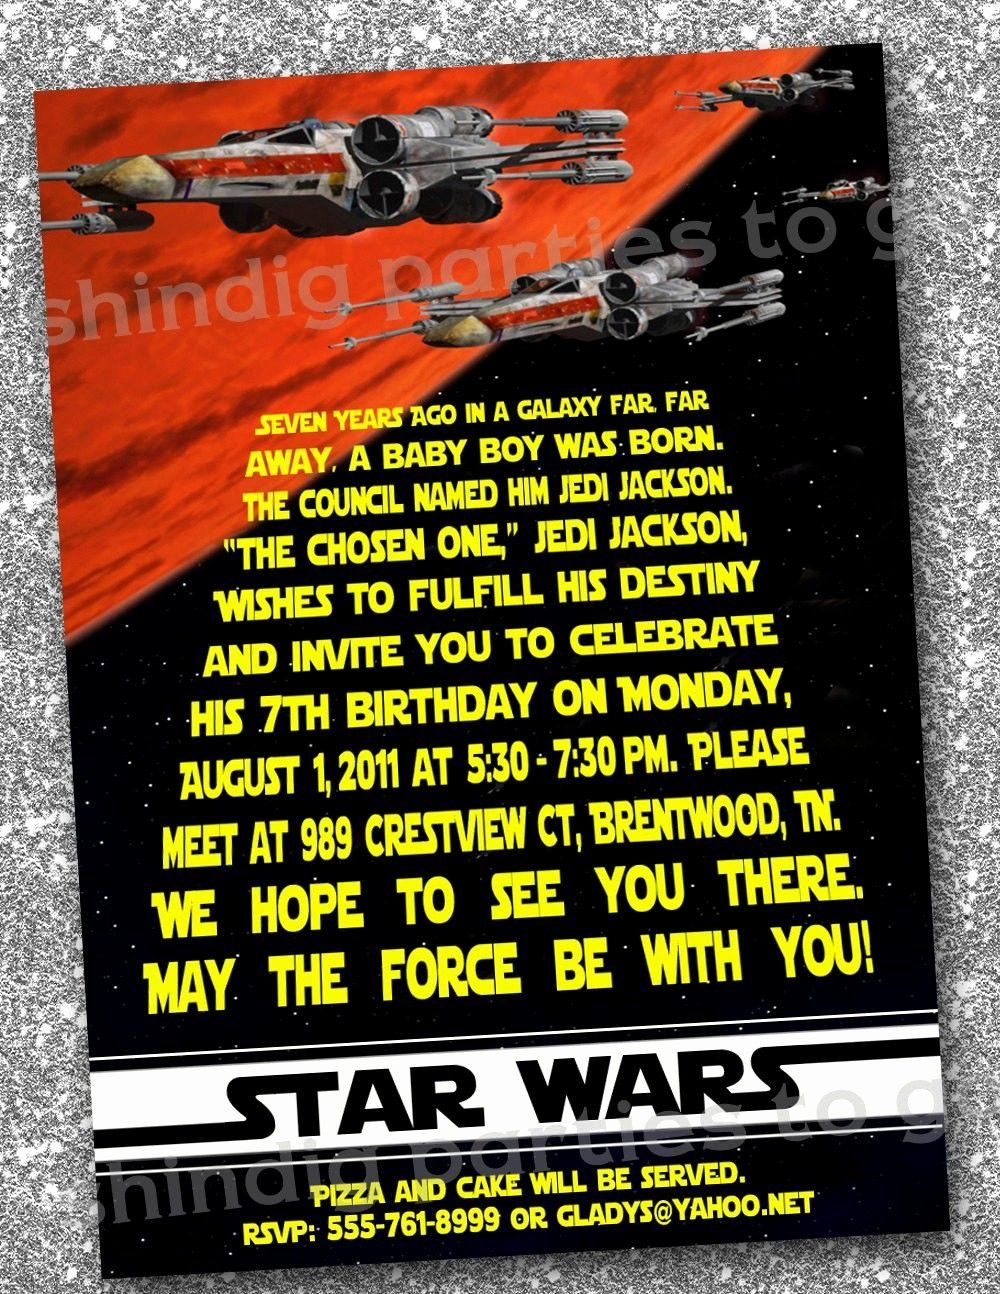 Printable Star Wars Birthday Invitations Beautiful Star Wars Birthday Invitations Templa Star Wars Invitations Star Wars Birthday Invitation Star Wars Birthday